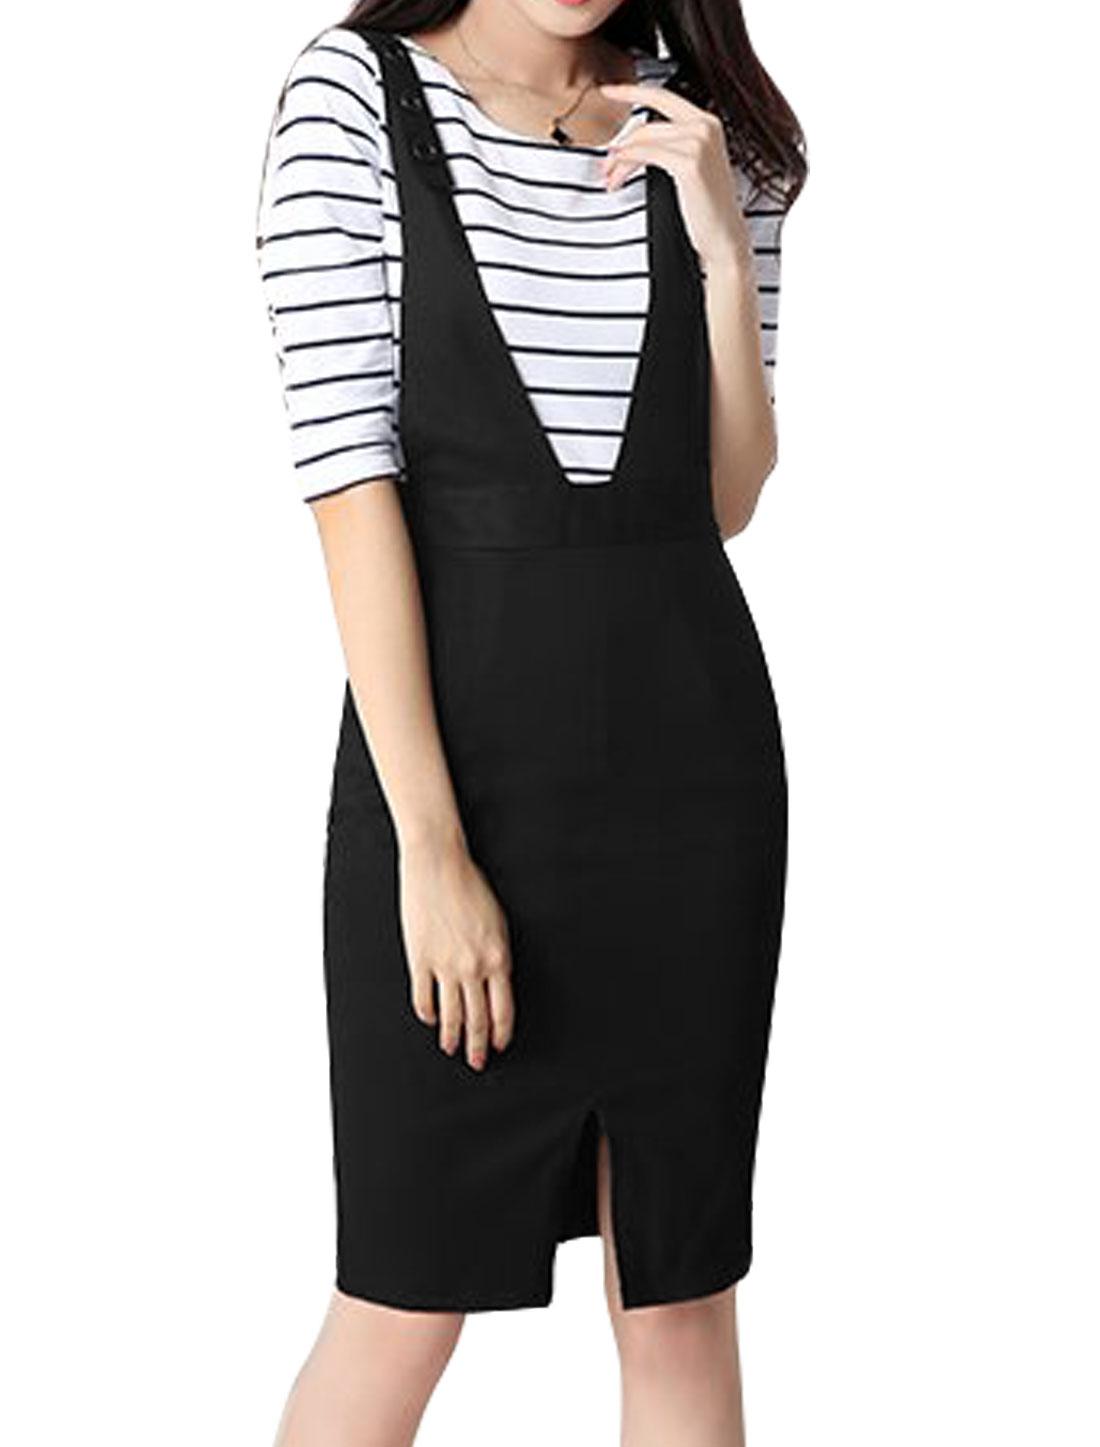 Women Adjustable Strap Split Front Suspender Skirt Black S